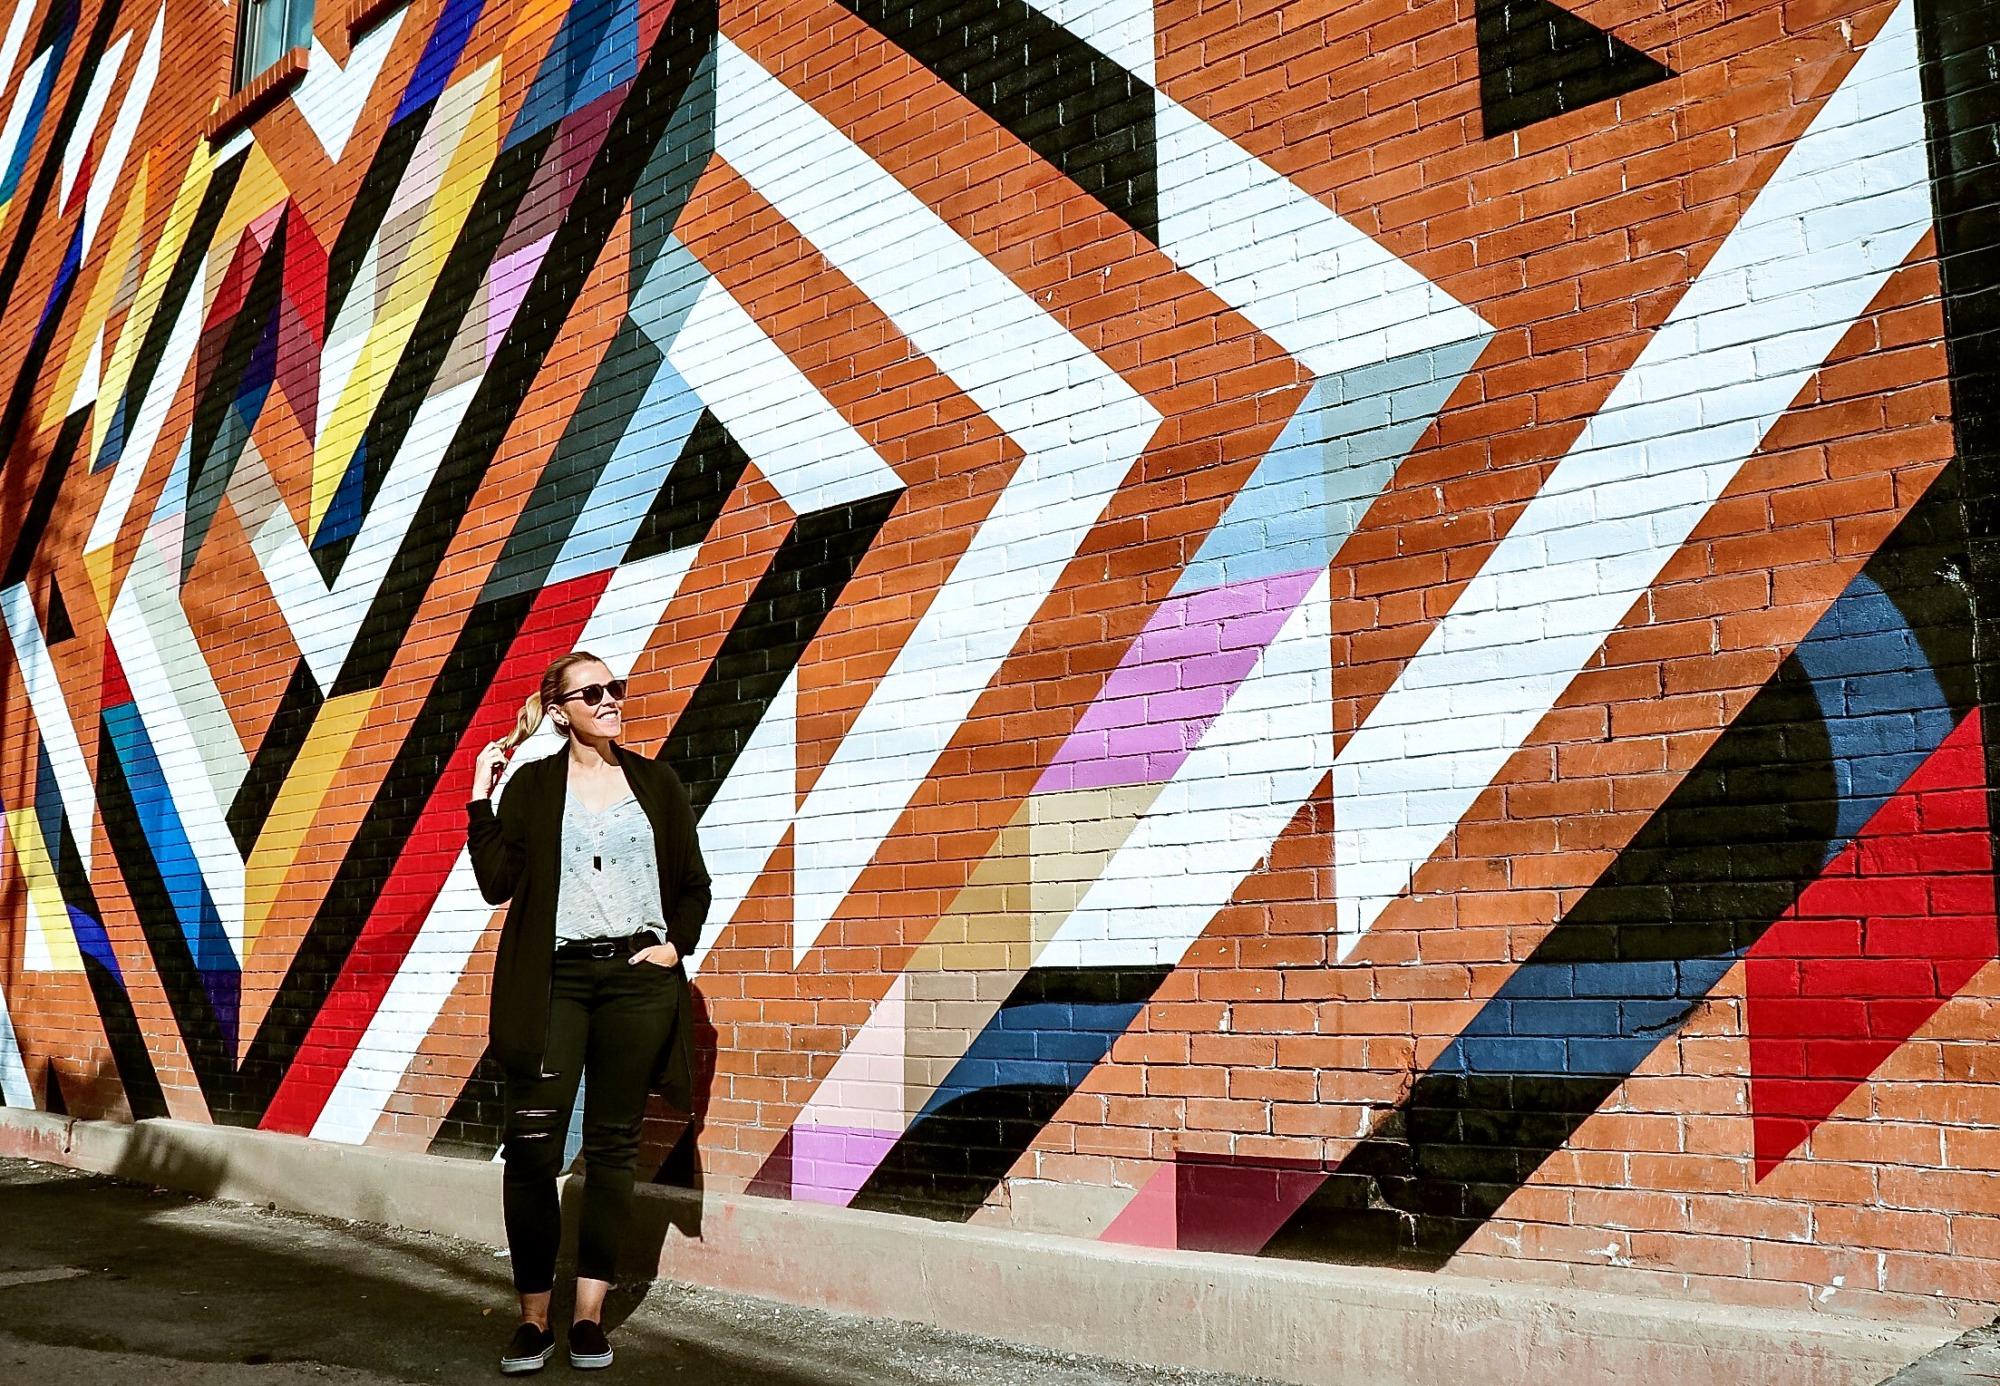 Instagrammable Walls in Calgary